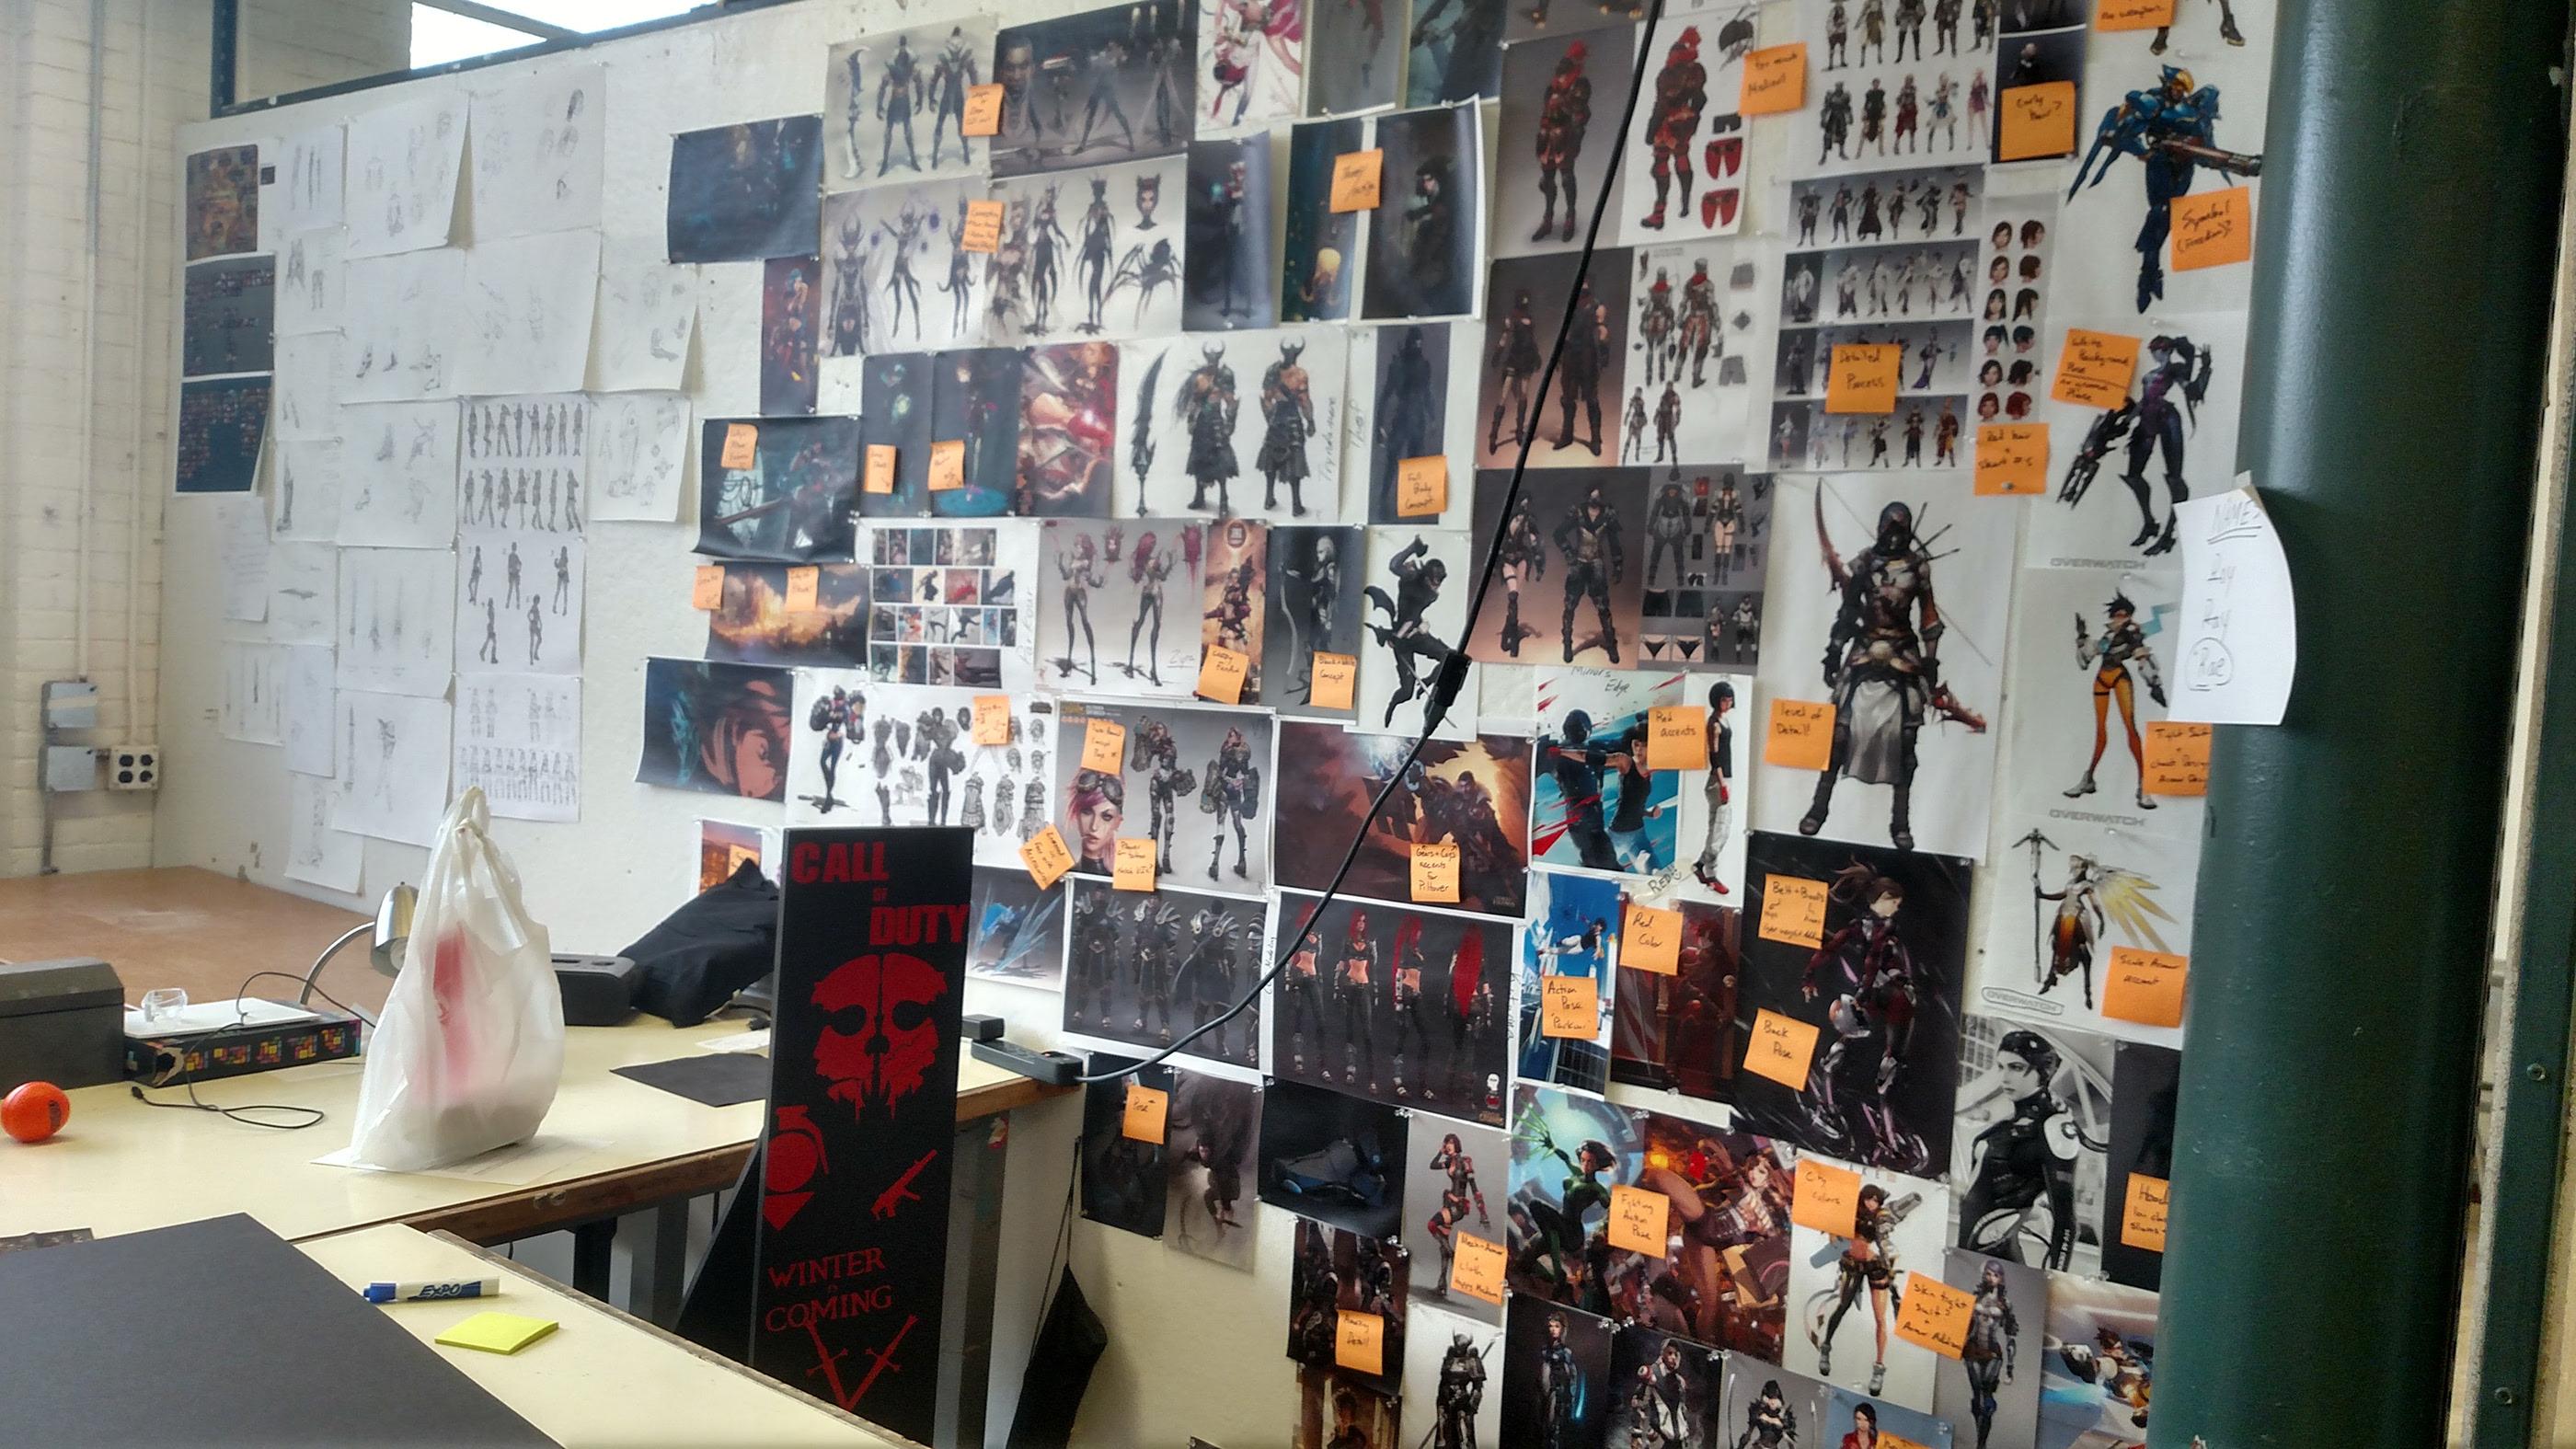 League of Legends Champion Concept - Rae on Behance